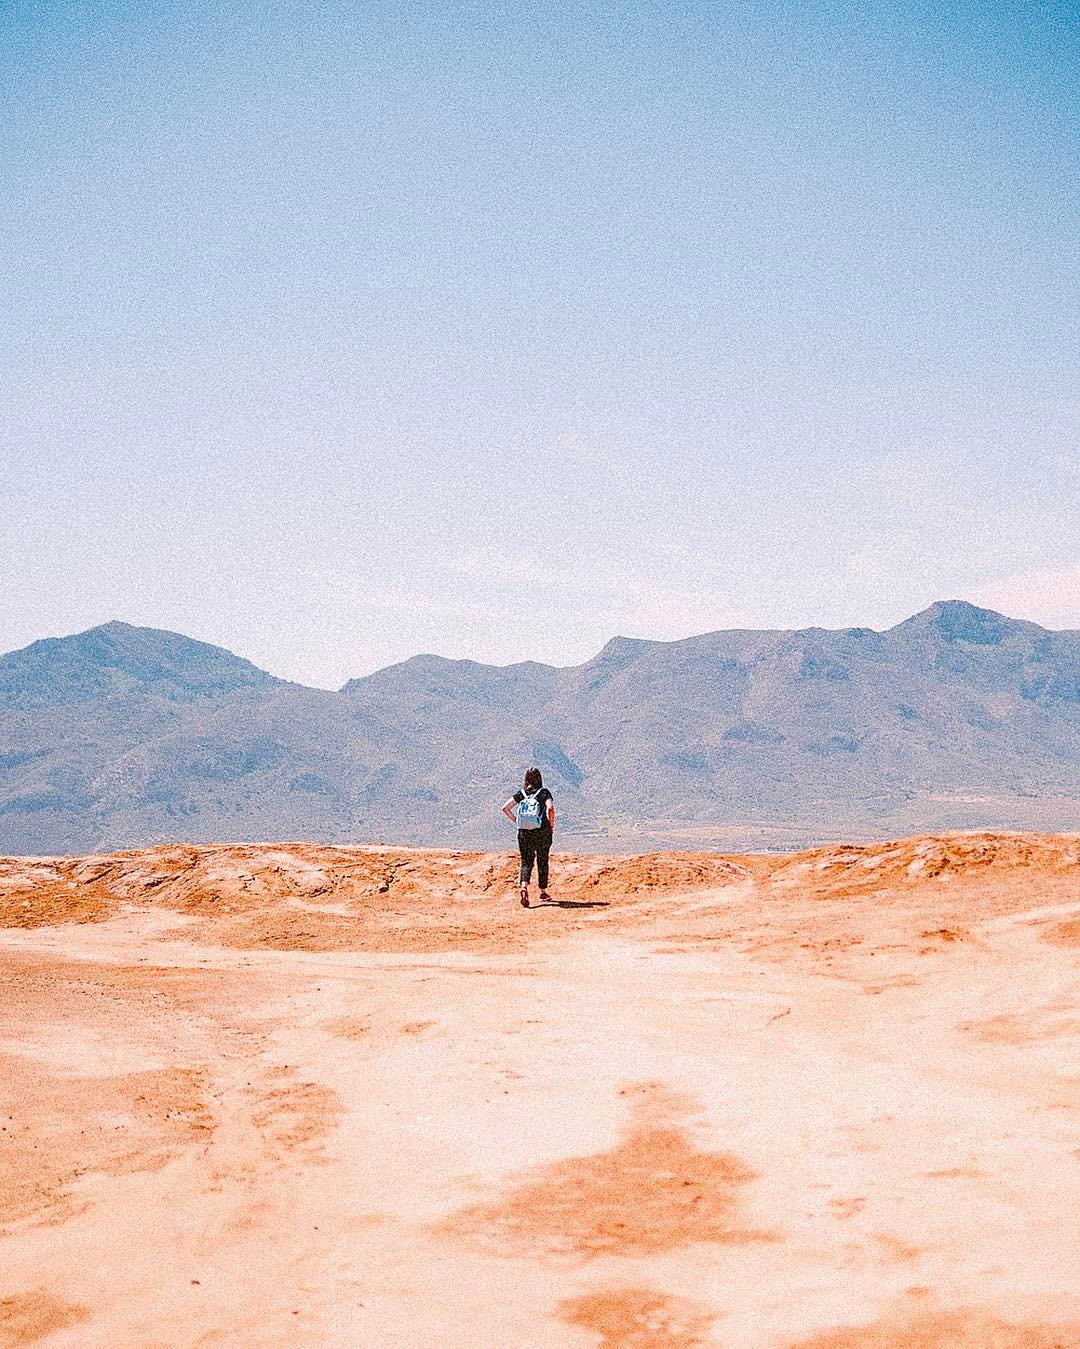 fotografo Joaquin Lucas paleta de colores de Wes Anderson  (39)